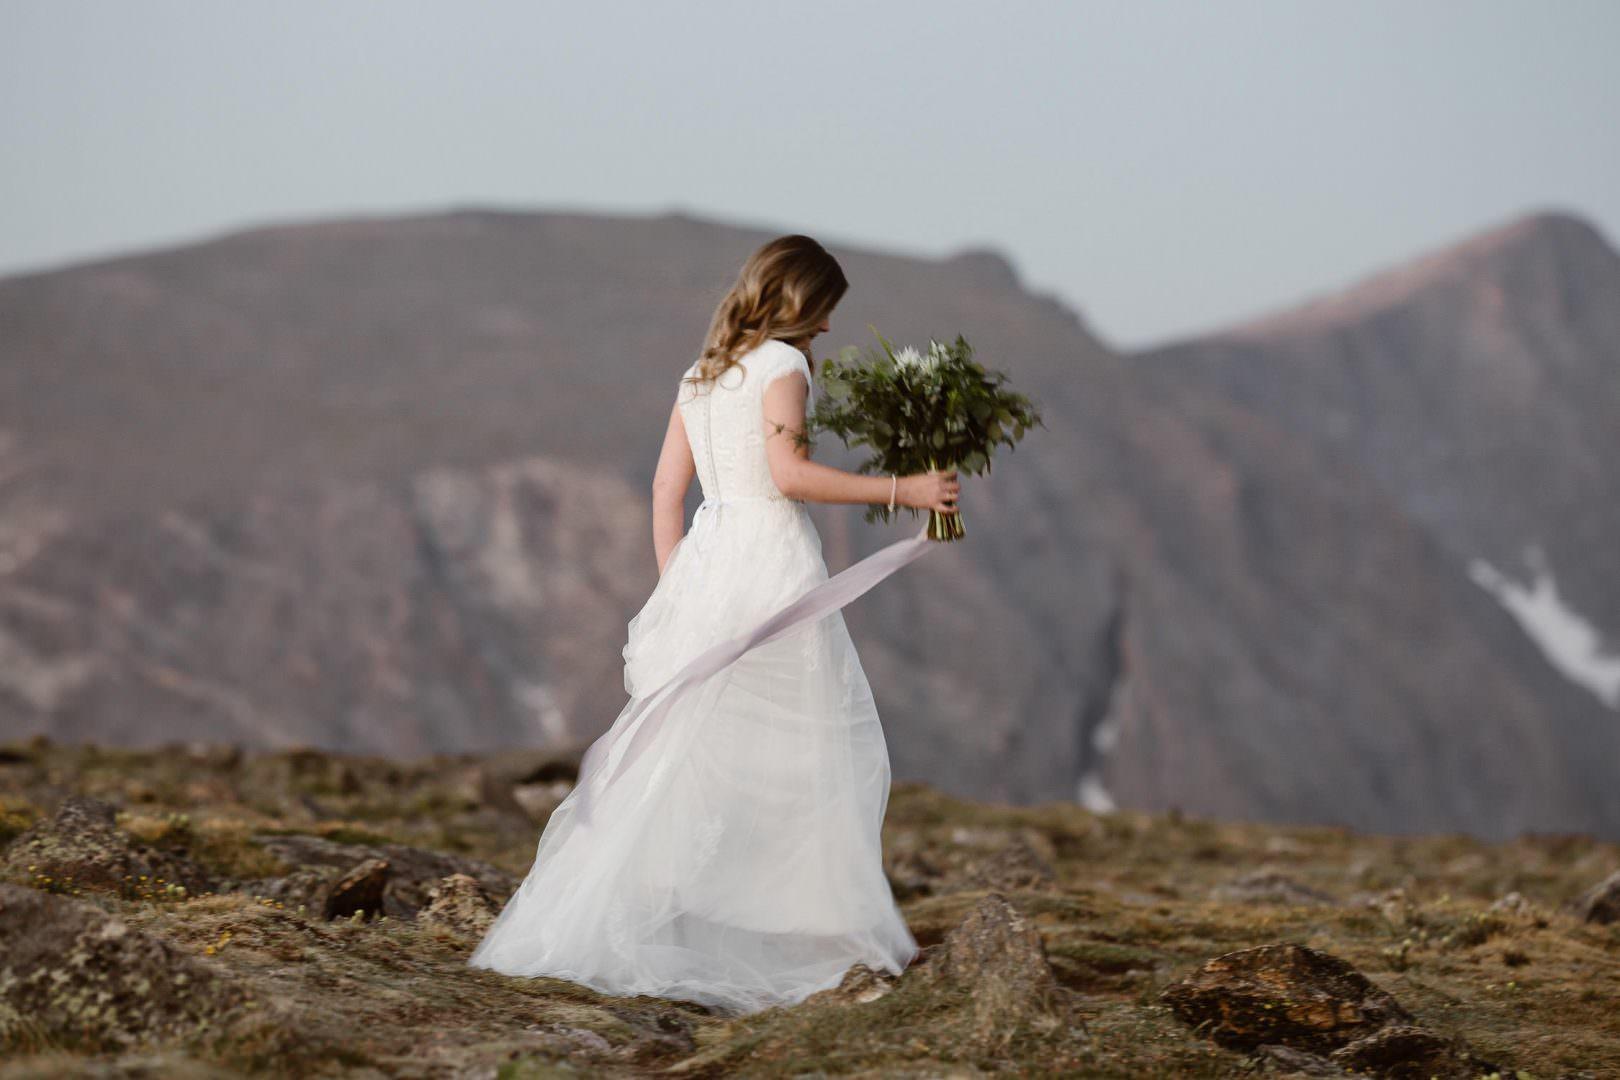 Colorado Adventure Elopements + Intimate Wedding Photography For Madly In Love |Colorado & Worldwide Timeless + Soulful + Emotive Colorado Wedding Photographer